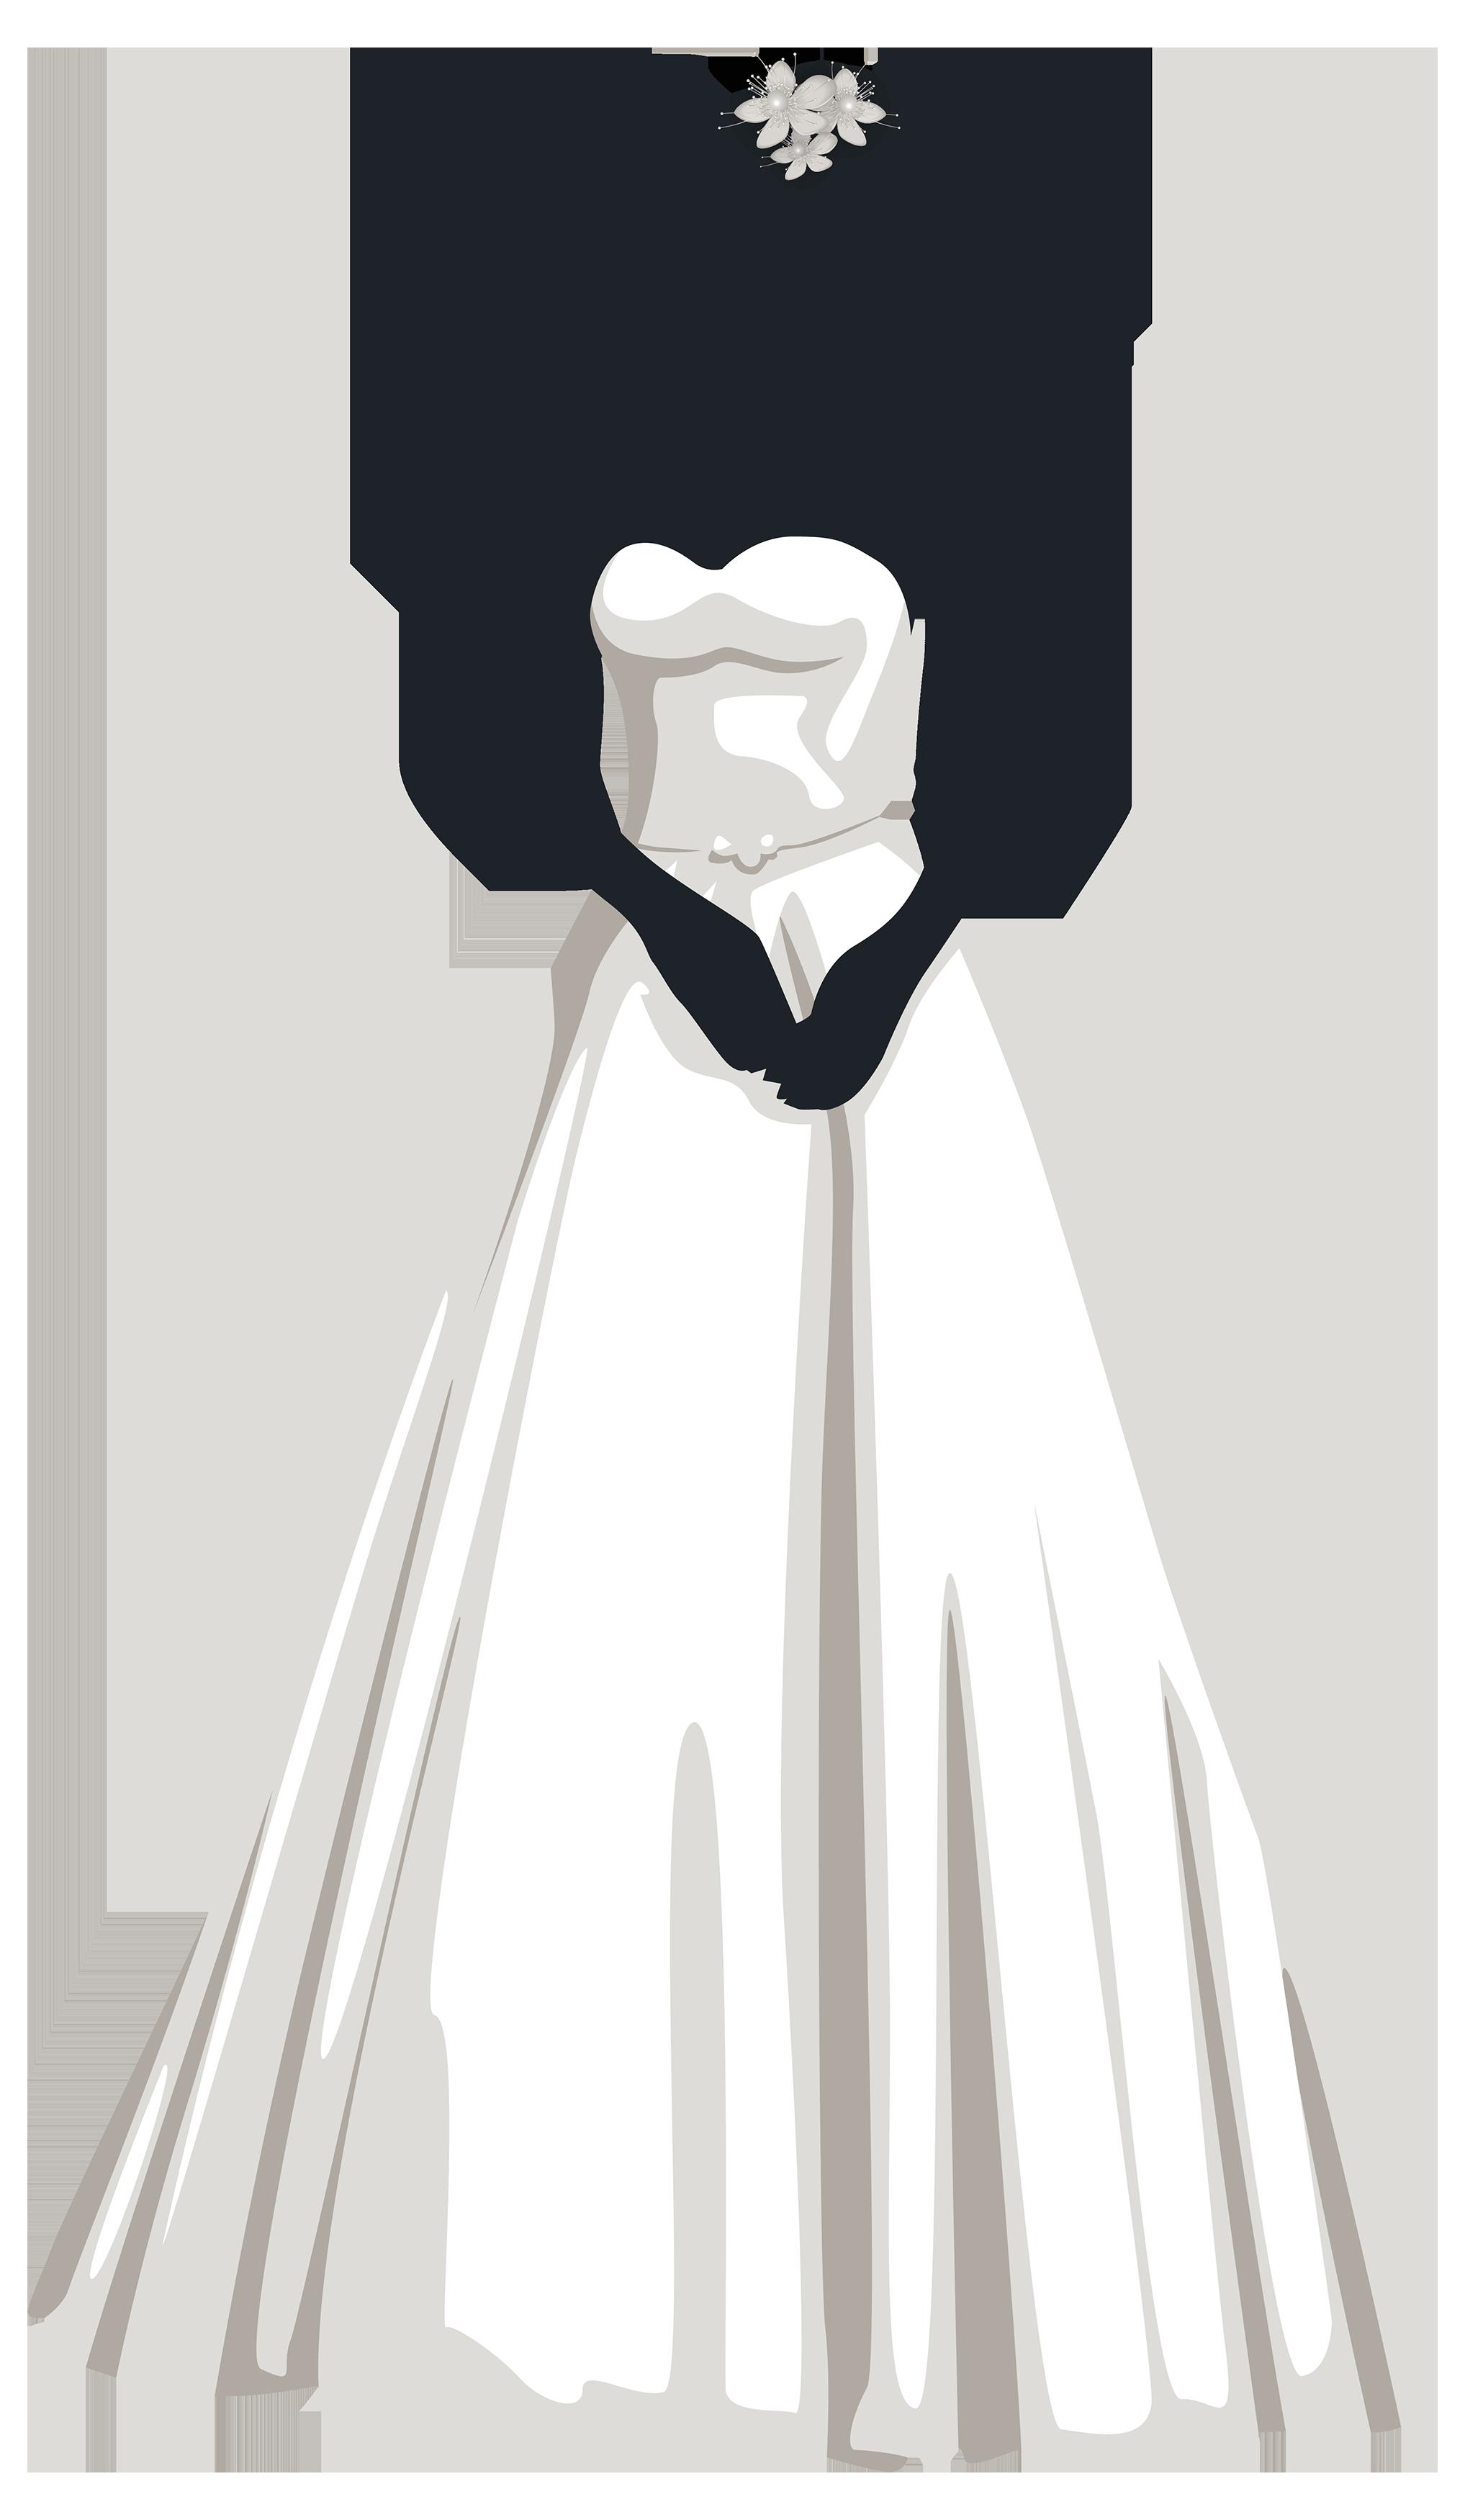 Bride clipart clip freeuse download Bride Silhouette PNG Clip Art - Best WEB Clipart clip freeuse download